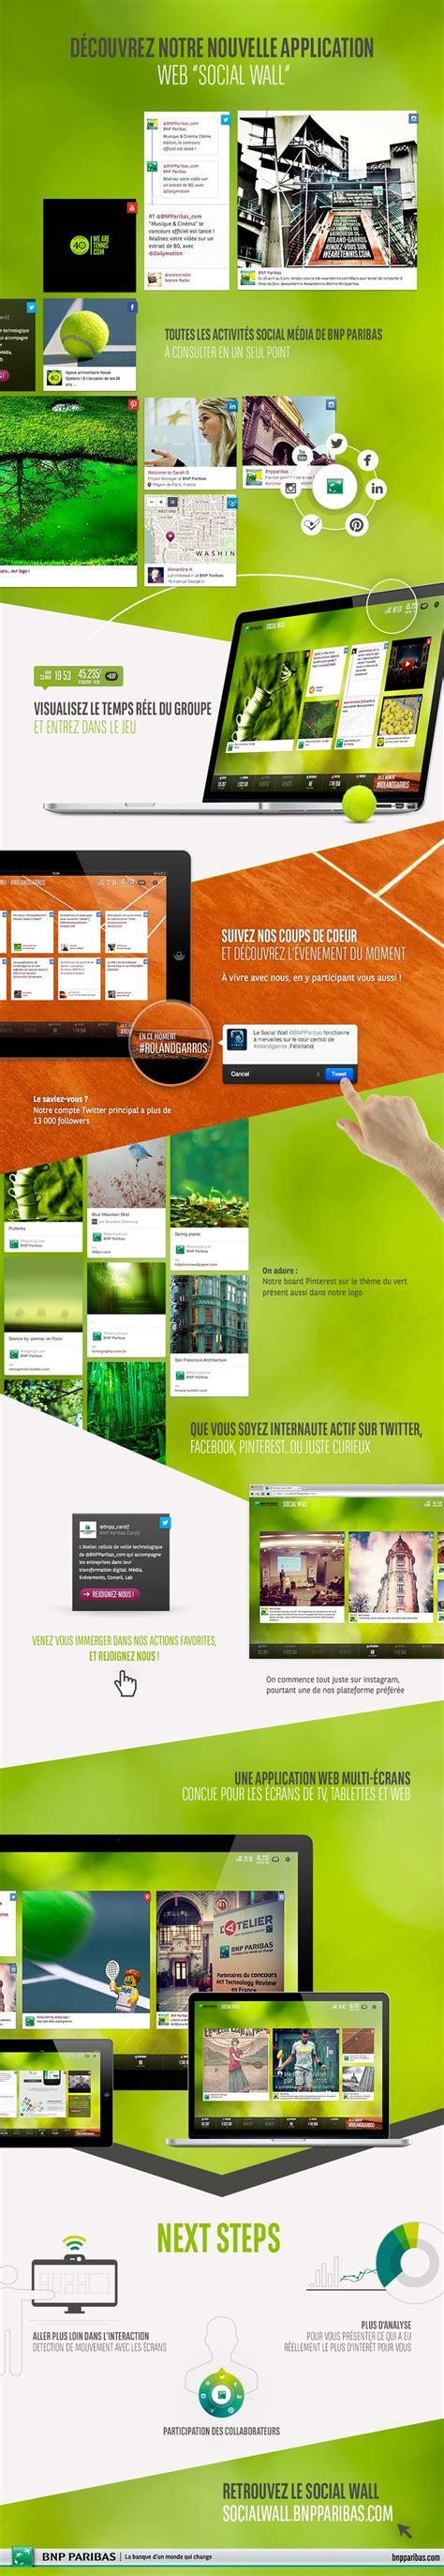 bnp si鑒e social pin by bnp paribas on innovation mobile